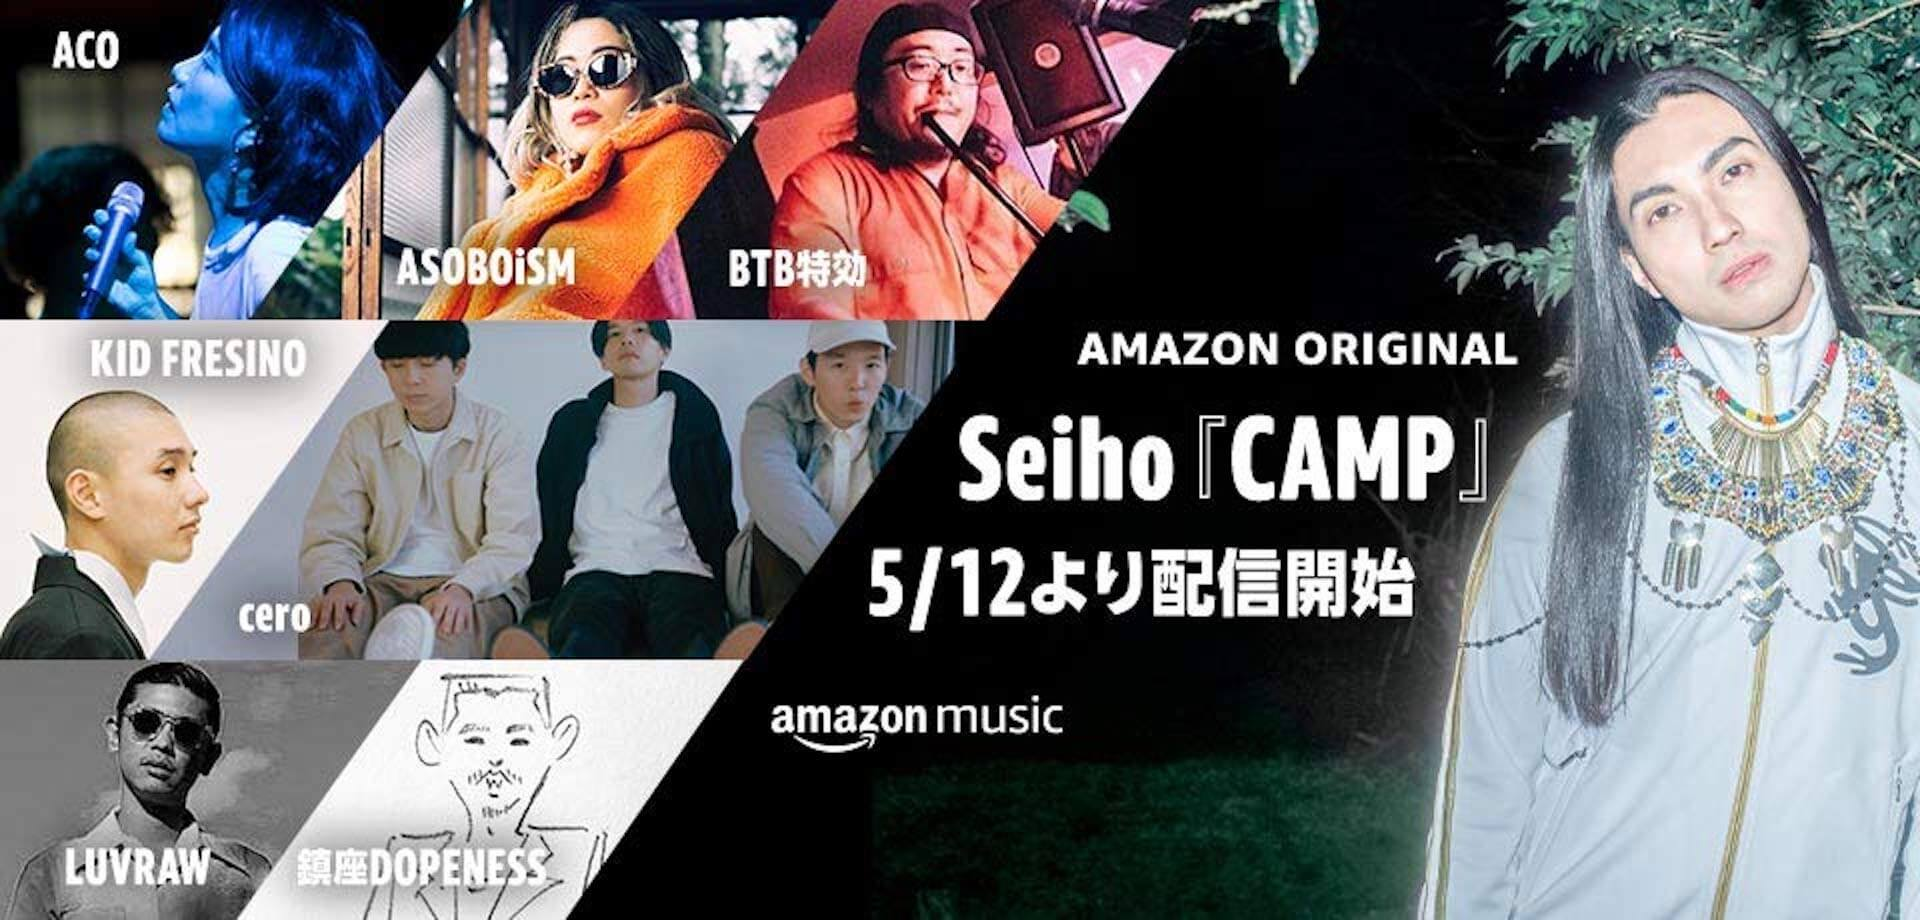 Amazon MusicからSeihoによるミニアルバム『CAMP』が独占配信決定!ACO、KID FRESINO、鎮座DOPENESSらが参加 music210427_camp-210427_1